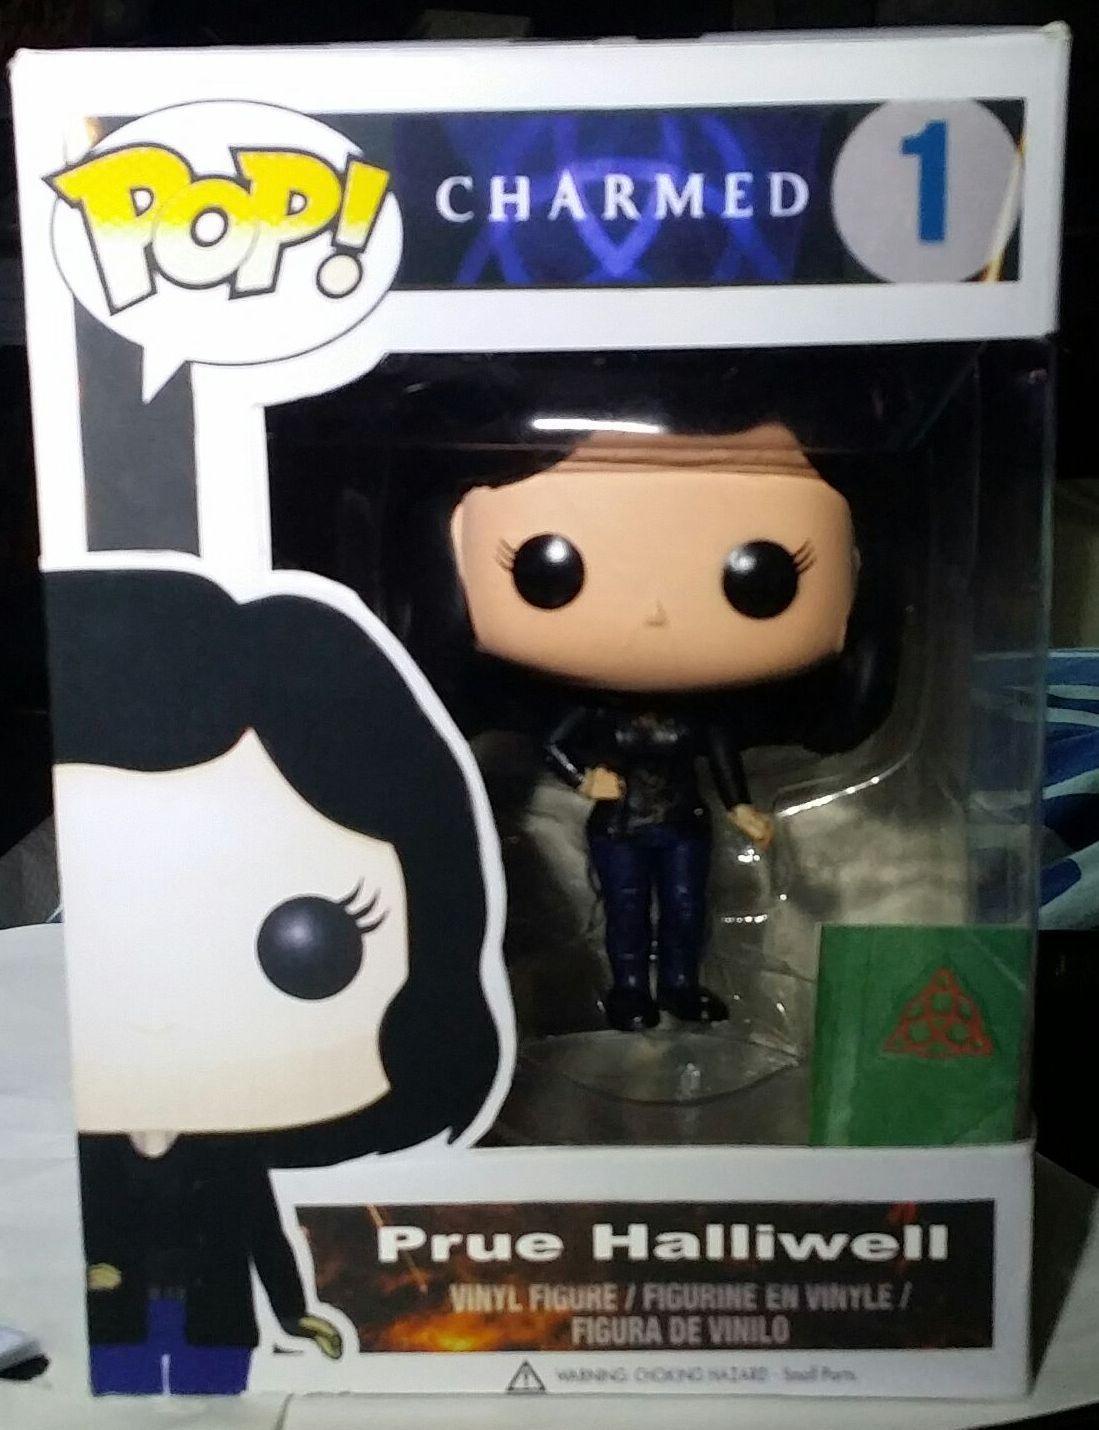 Prue Halliwell Charmed Made By Https Www Facebook Com Pages Pop Vinyl Customs 755923941133419 Funko Pop Vinyl Collection Vinyl Figures Funko Pop Toys